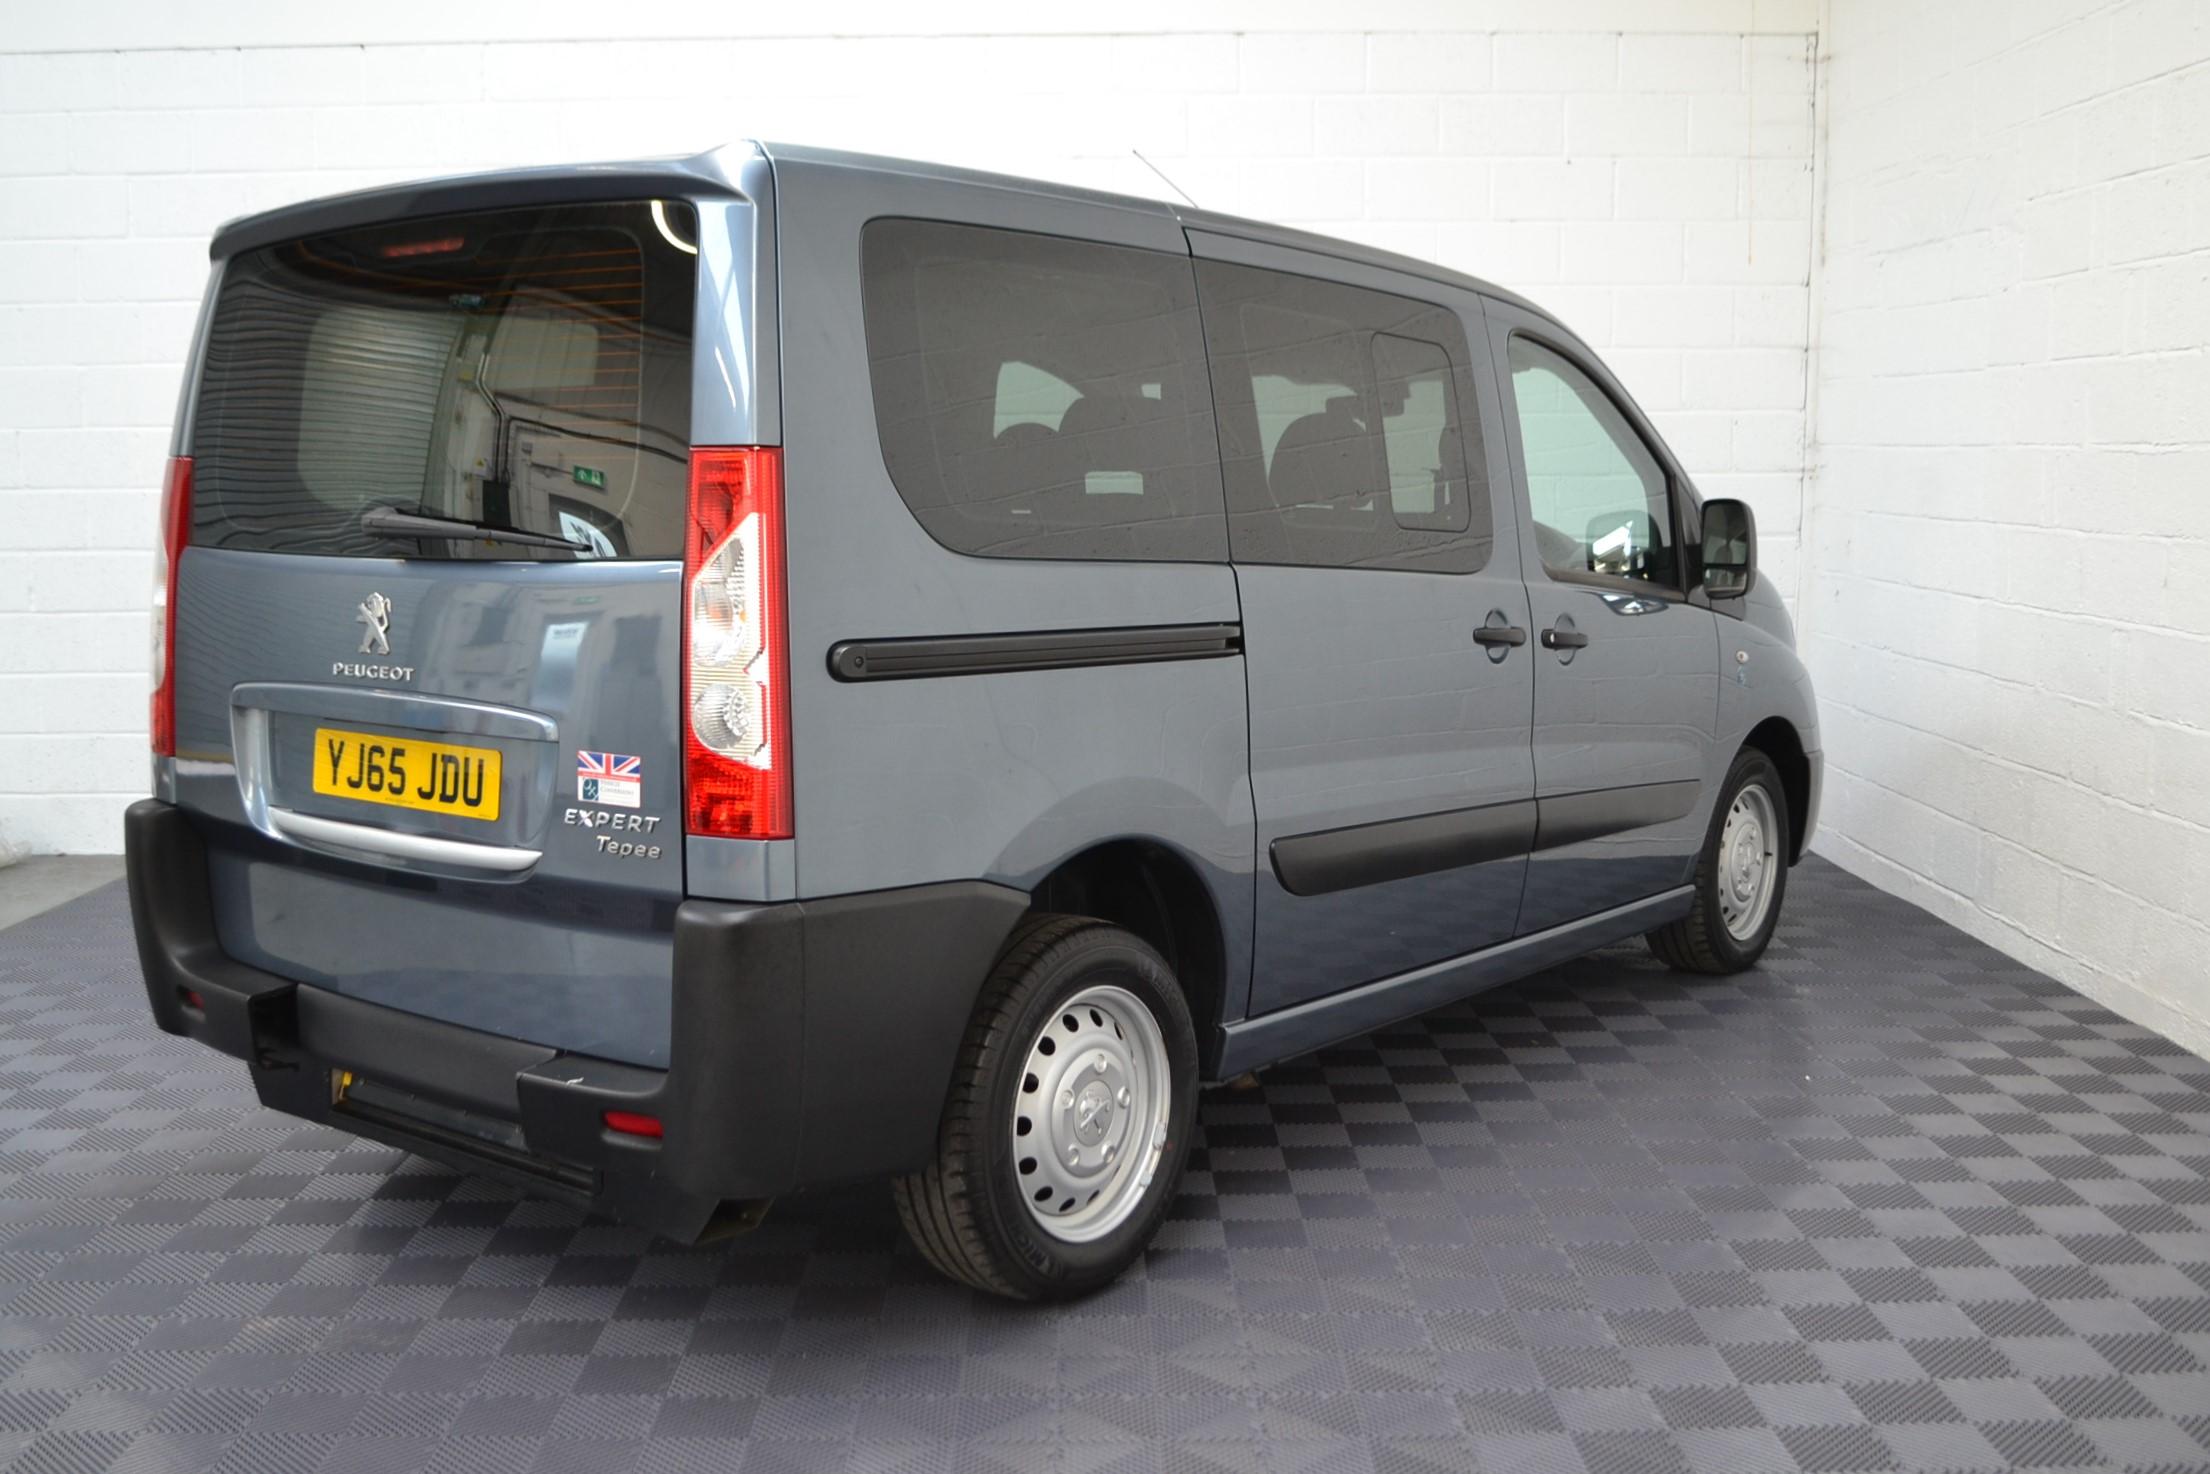 WAV Cars For Sale Bristol Wheelchair Accessible Vehicles Used For Sale Somerset Devon Dorset Bath Peugeot Expert YJ65 JDU 6